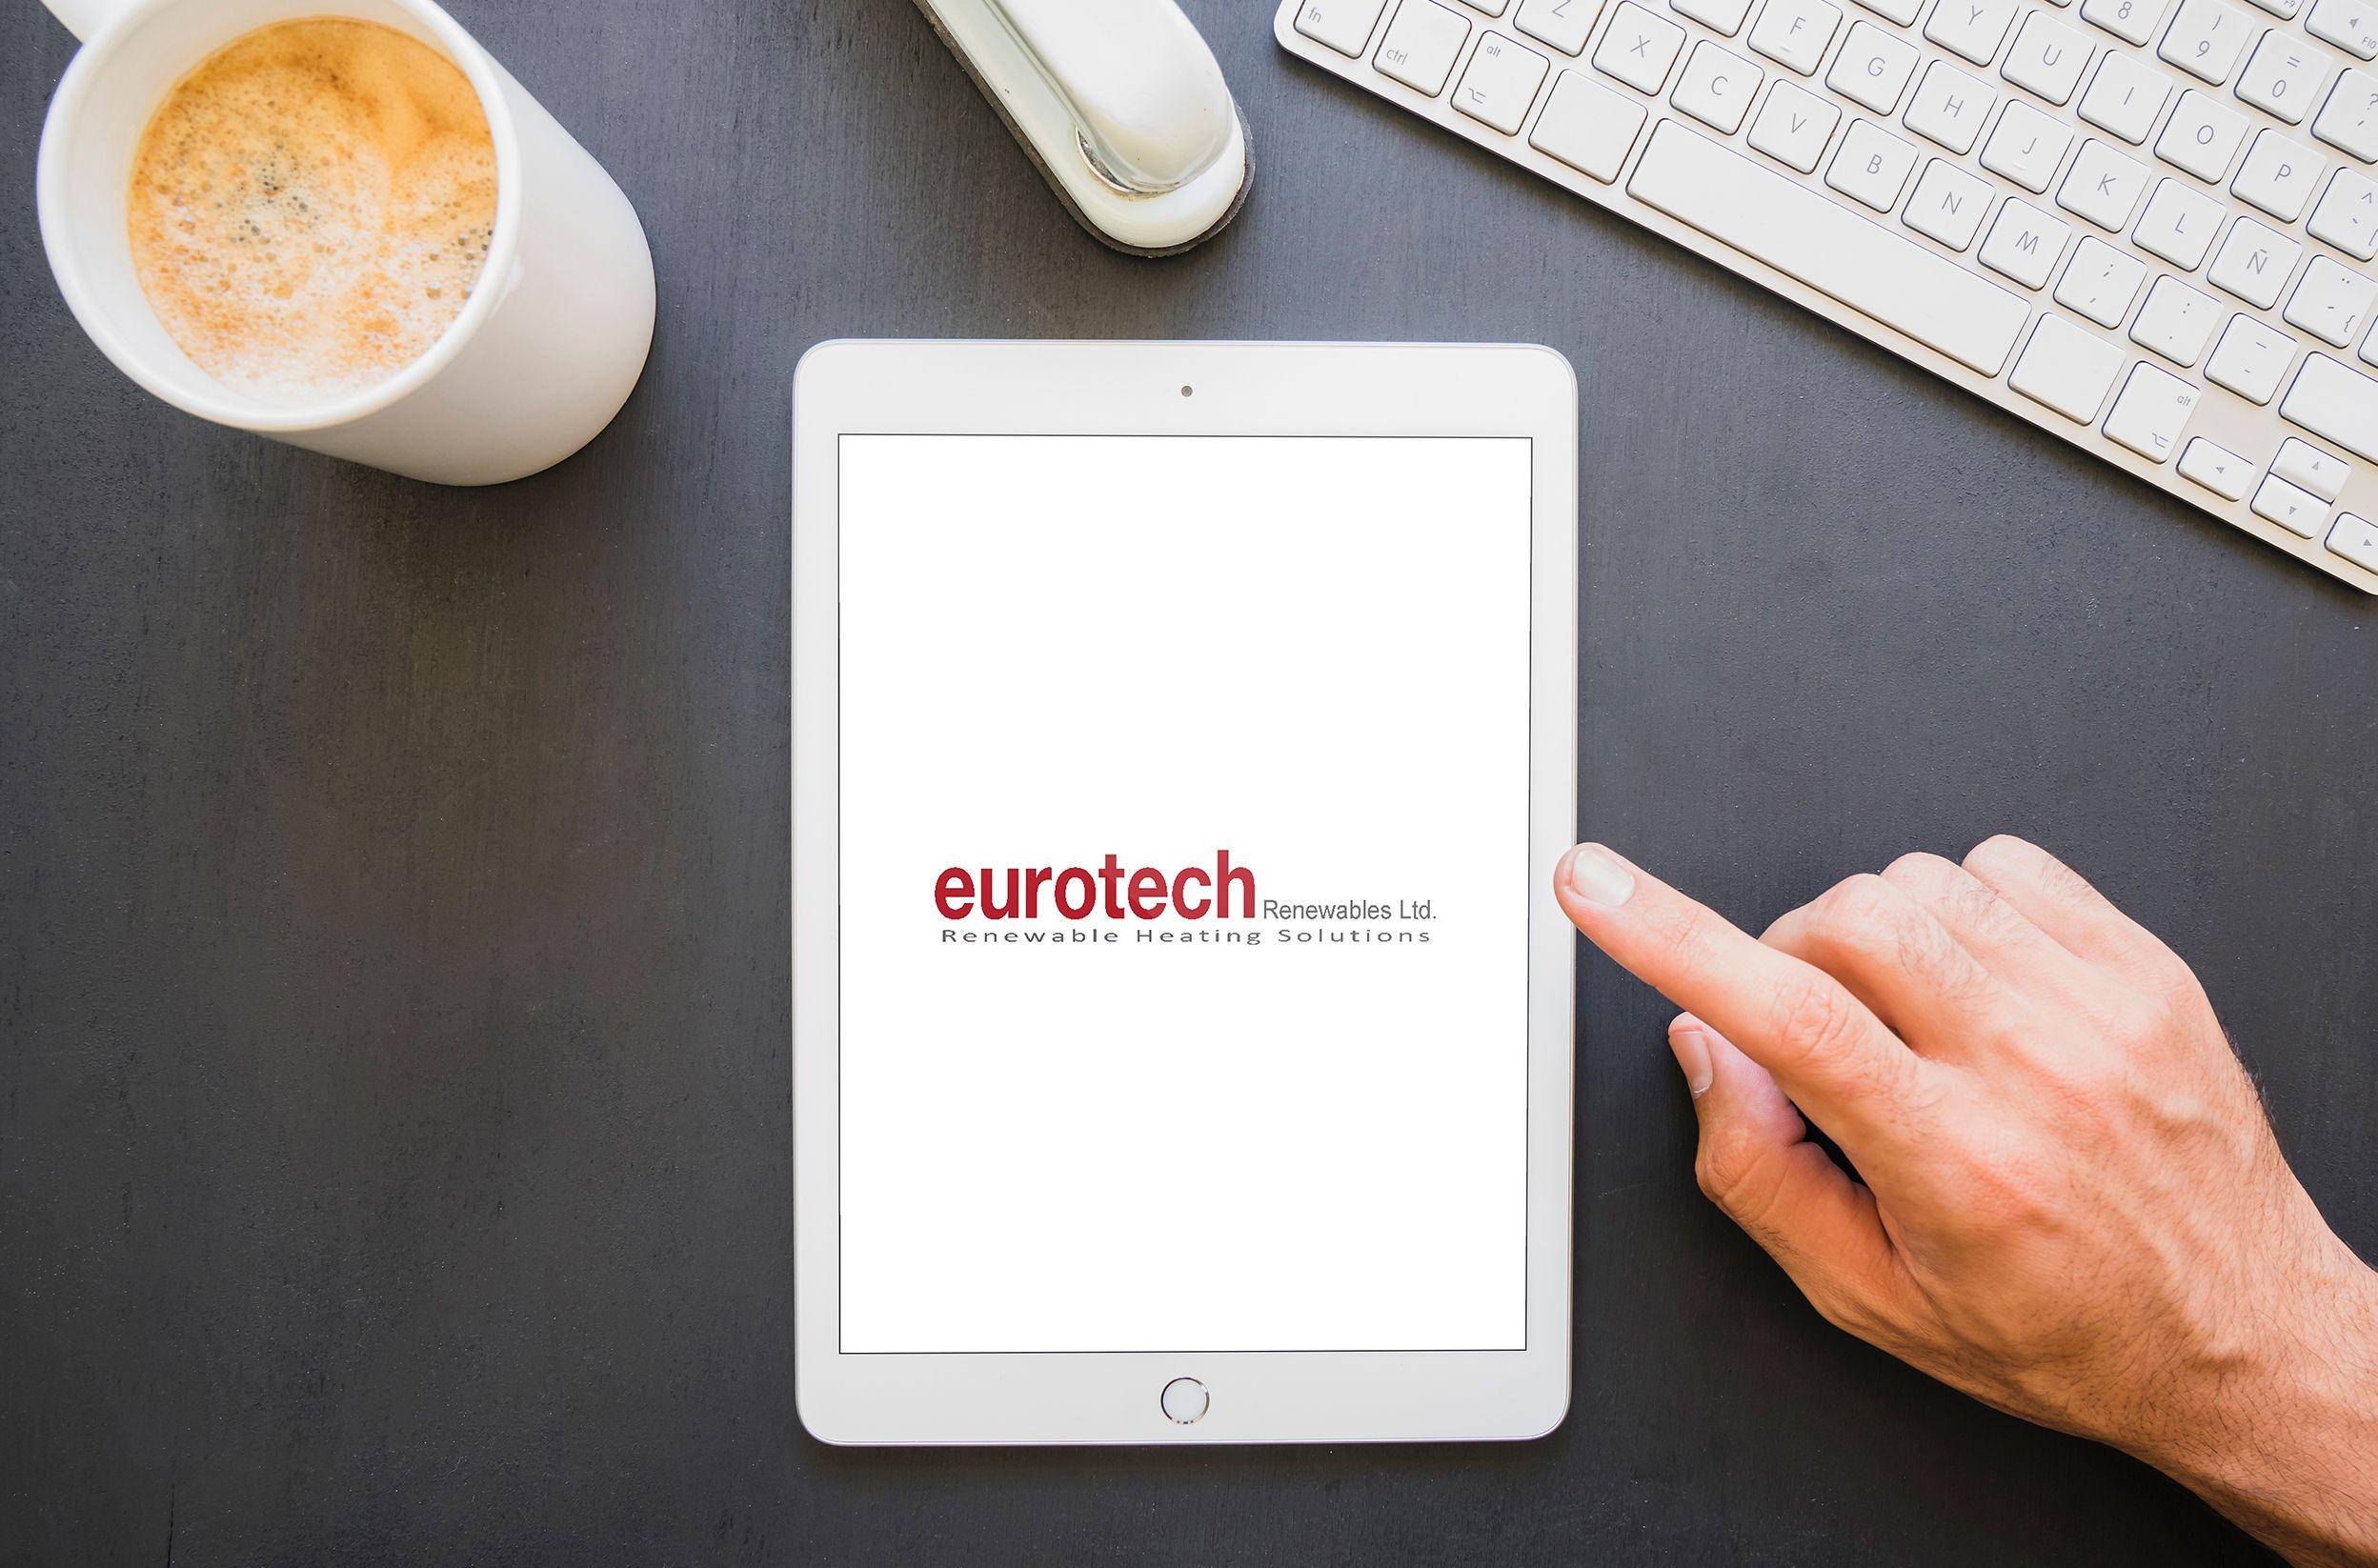 eurotech-5